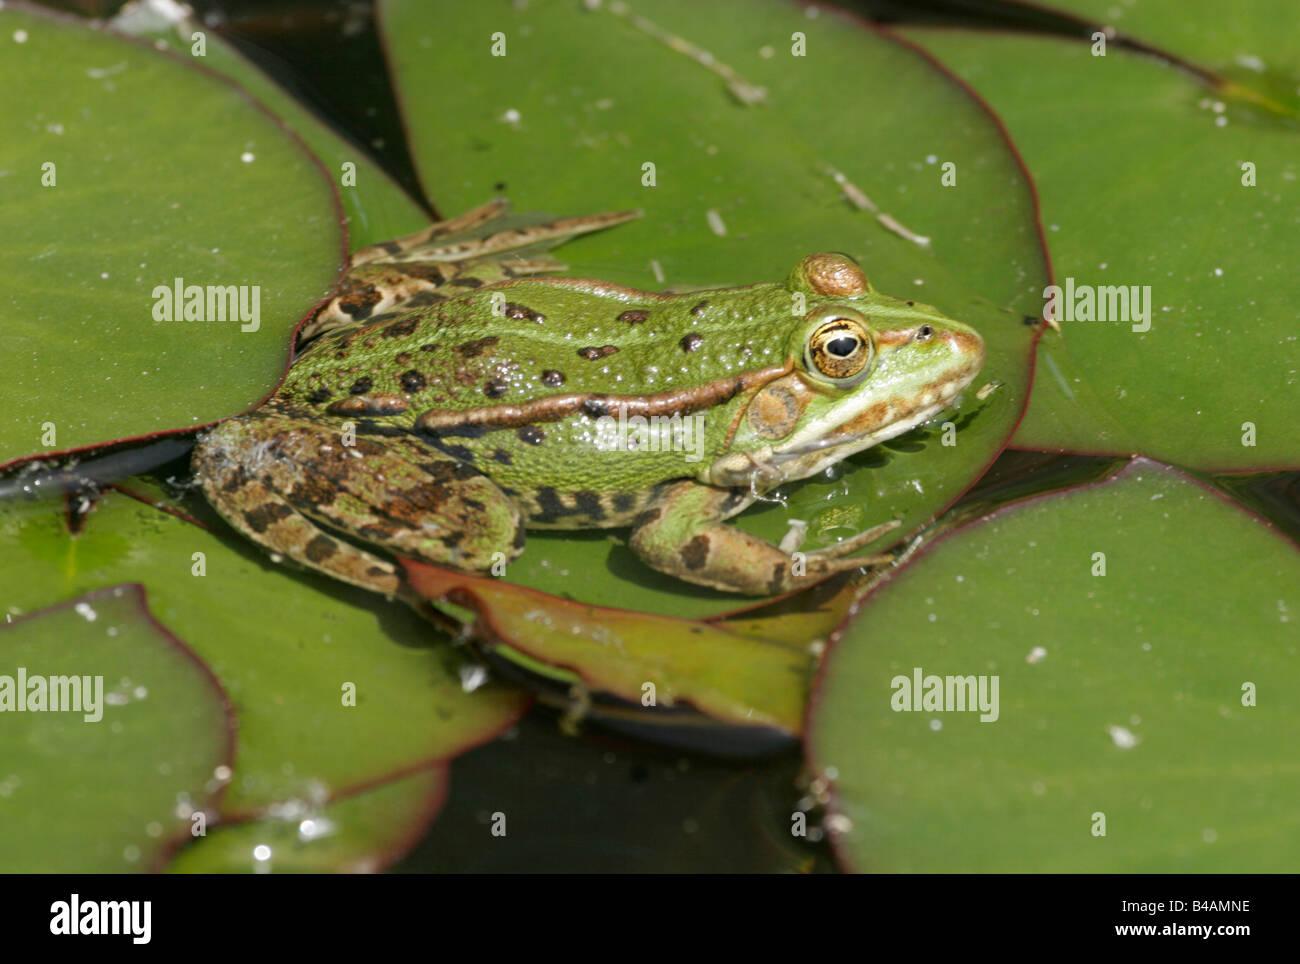 zoology animals amphibian frogs pool frog sitting on leaf of